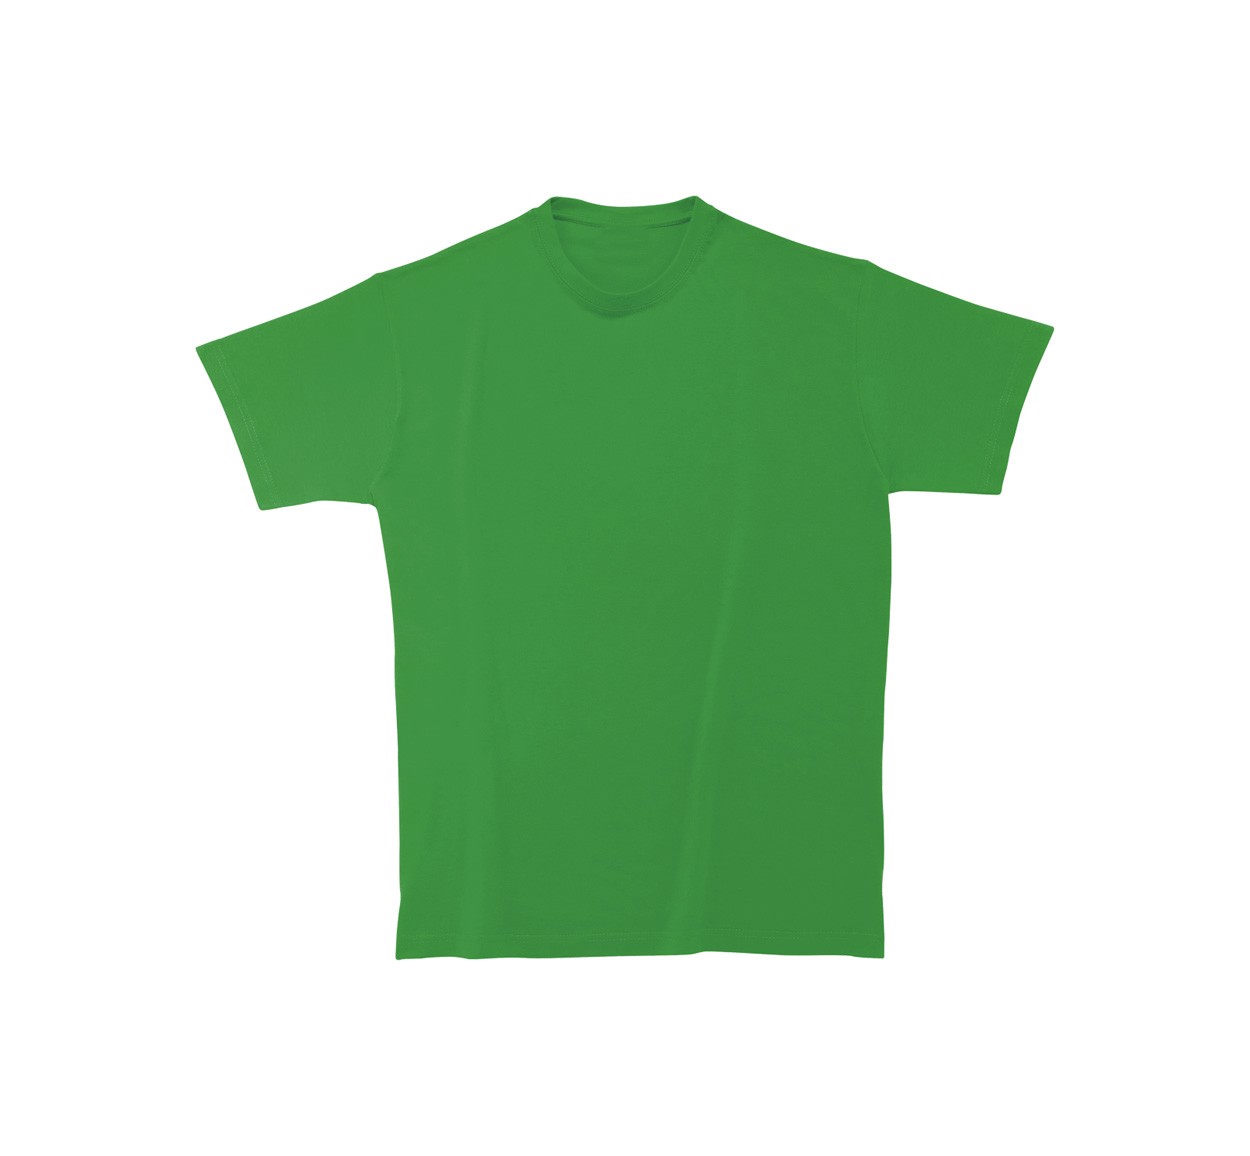 T-Shirt Heavy Cotton - Green / M